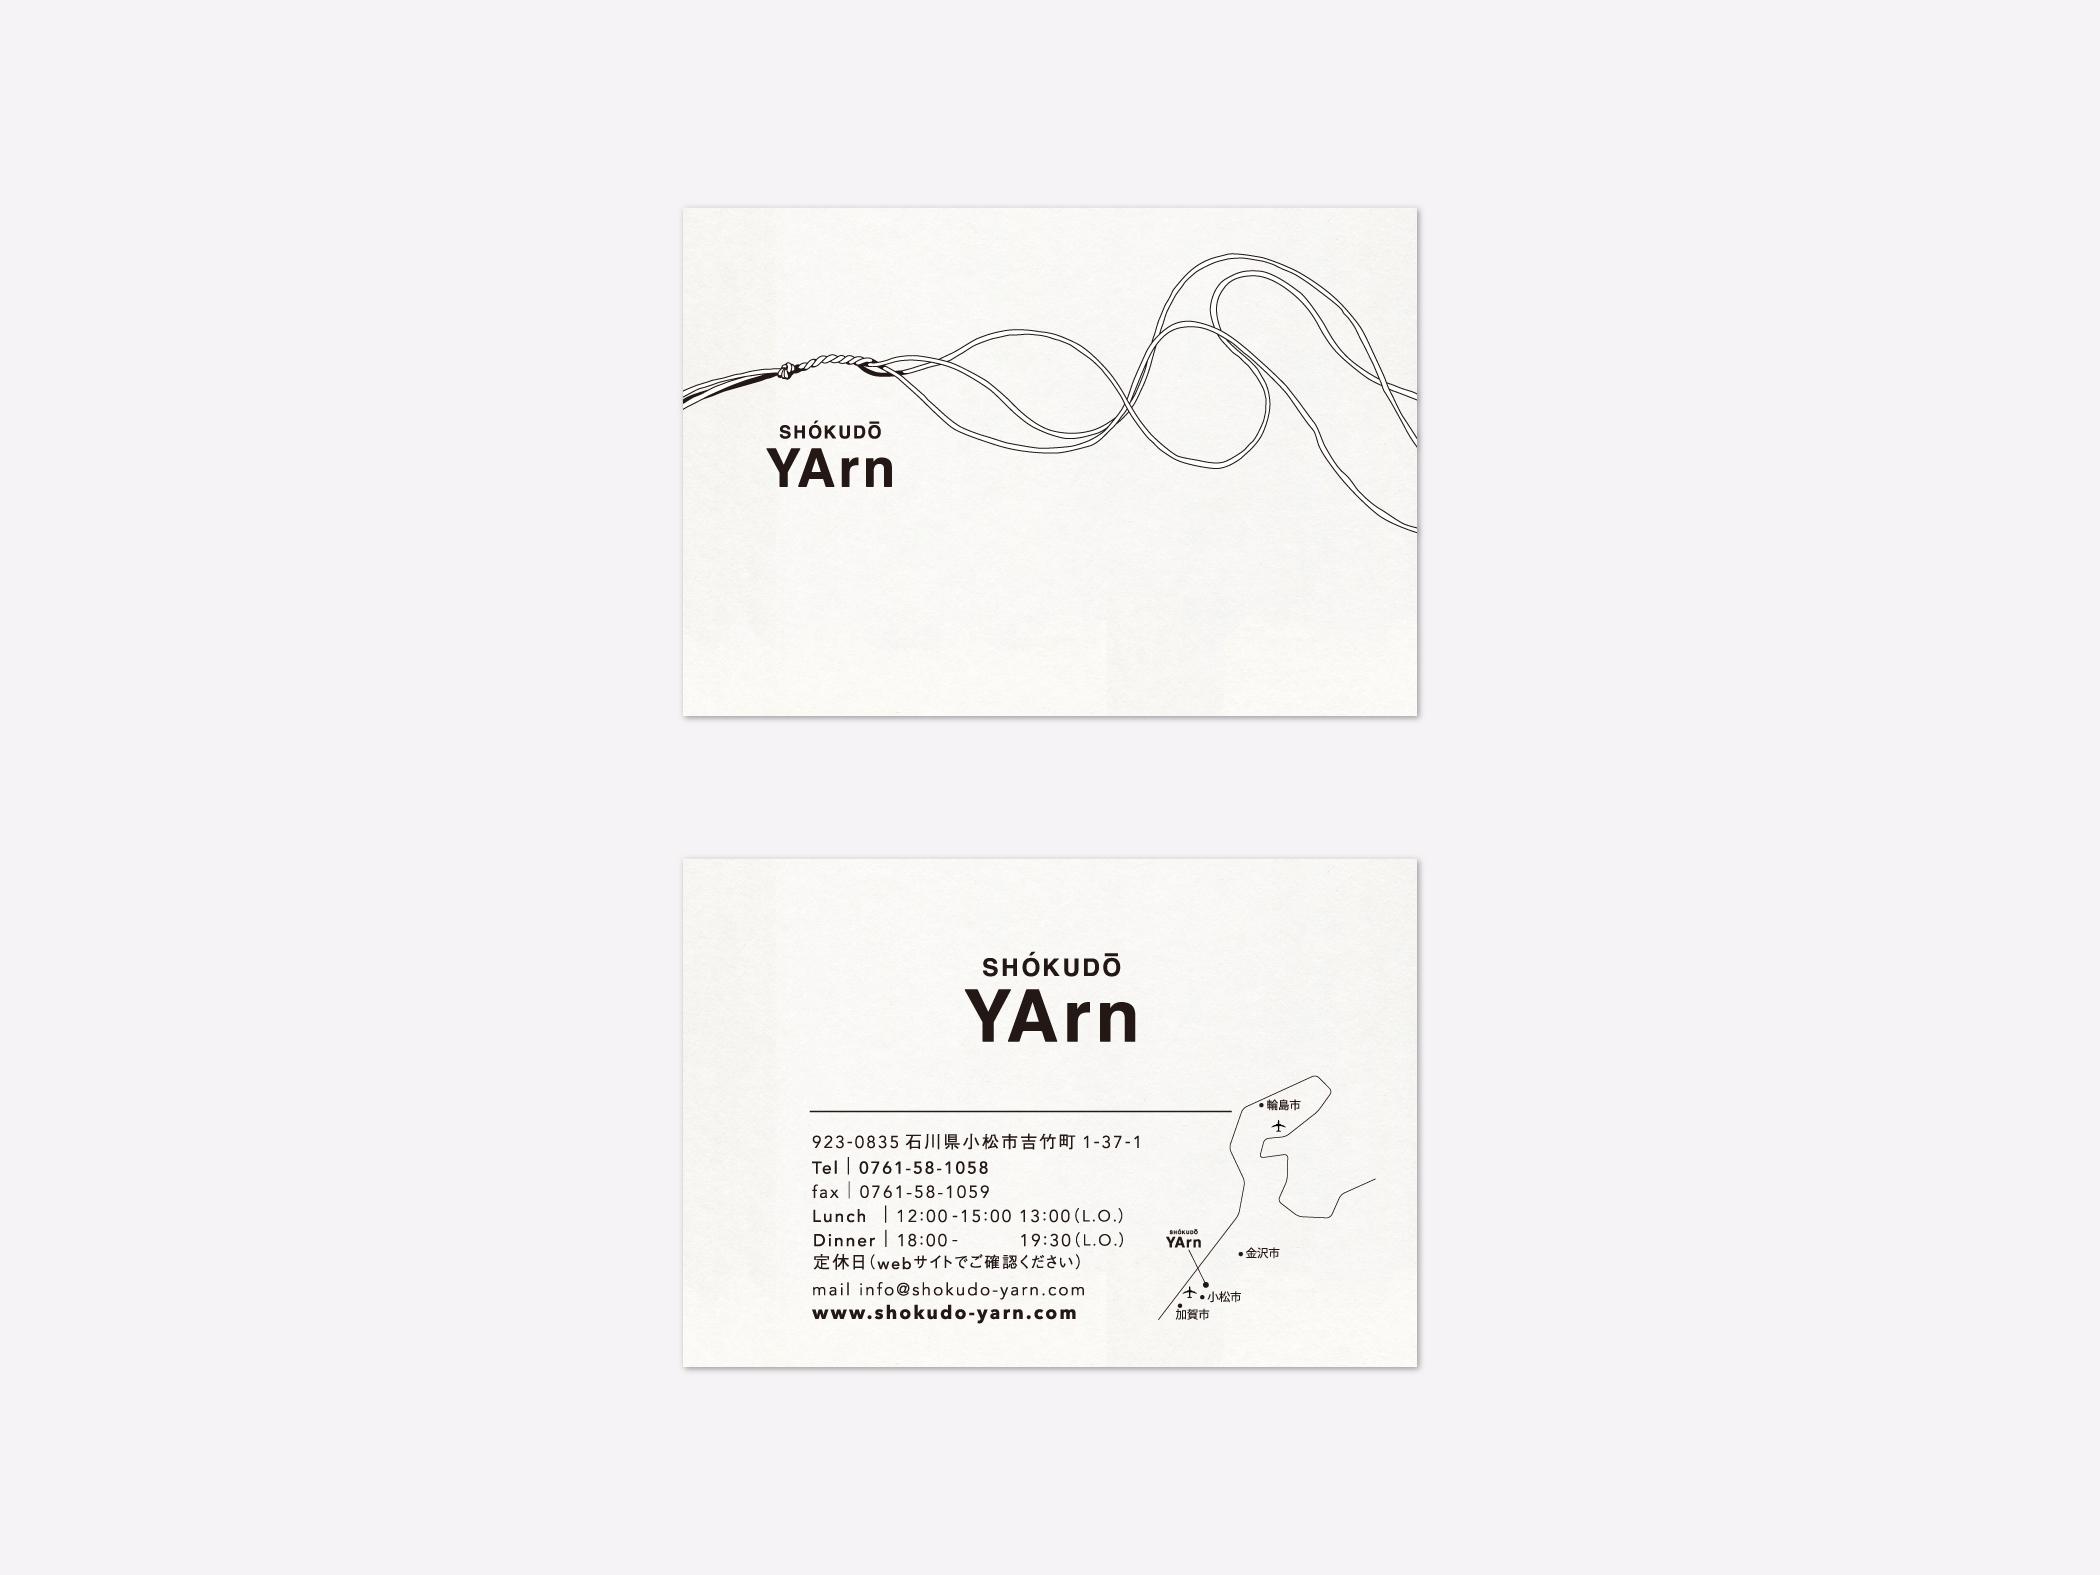 SHOKUDO YArn のショップカード